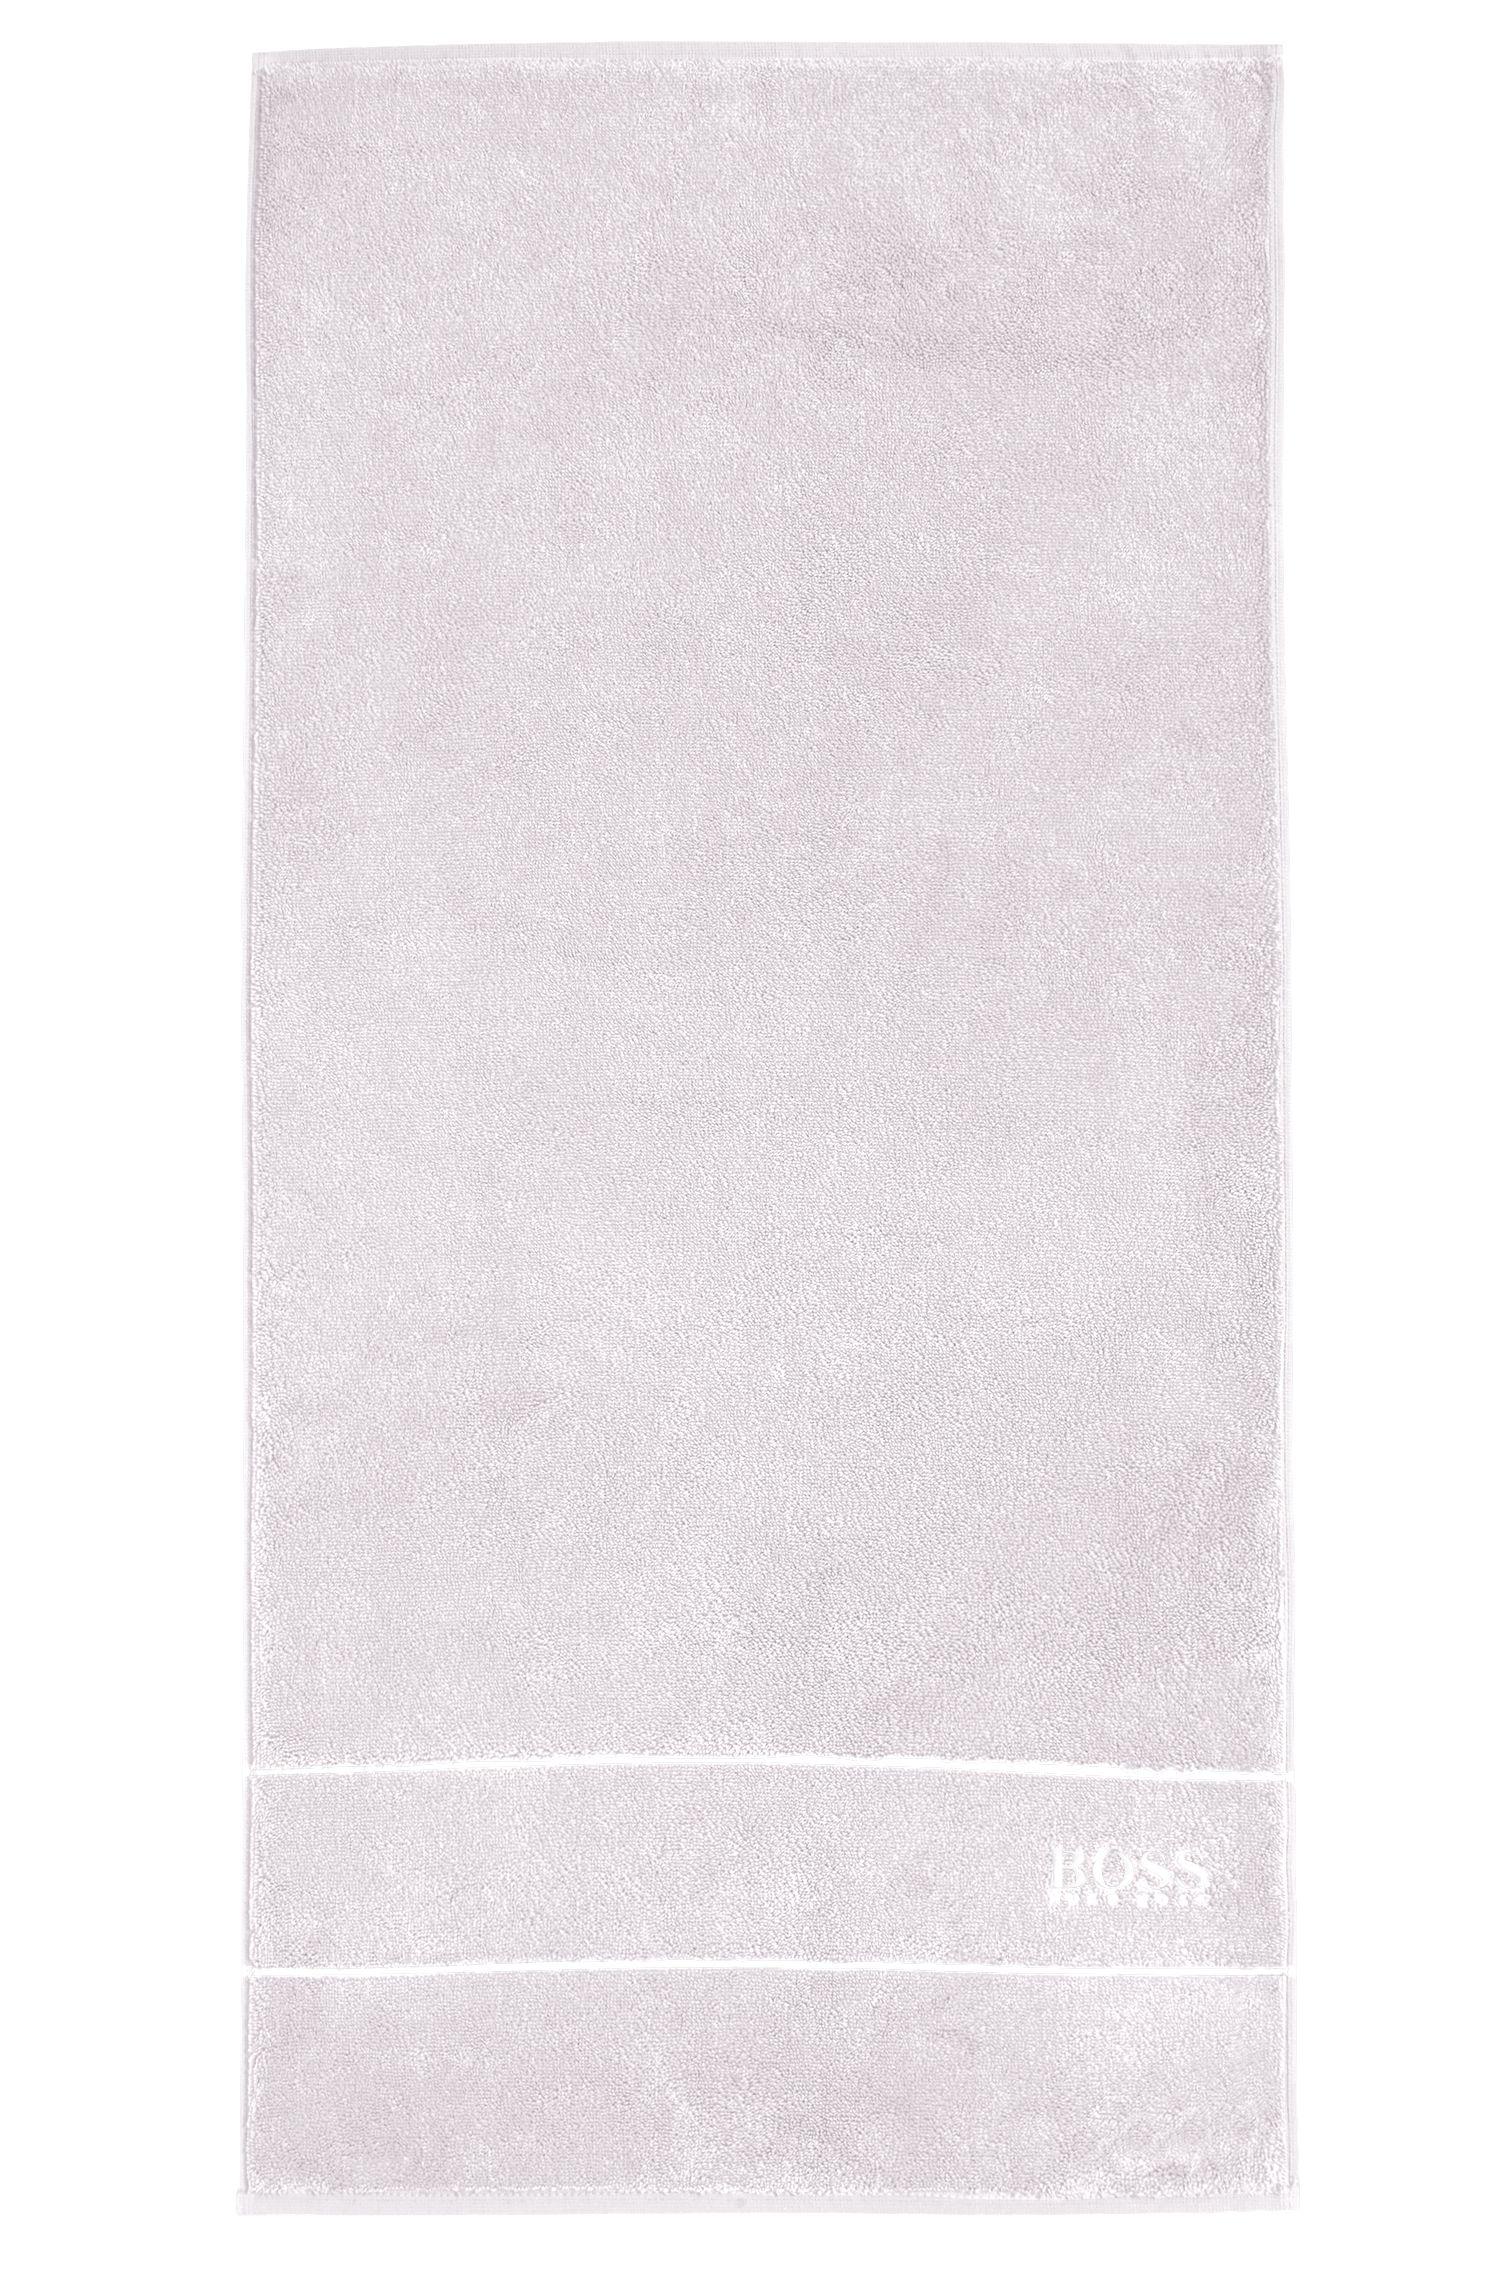 Hand towel 'PLAIN Serviette toile' in cotton terry